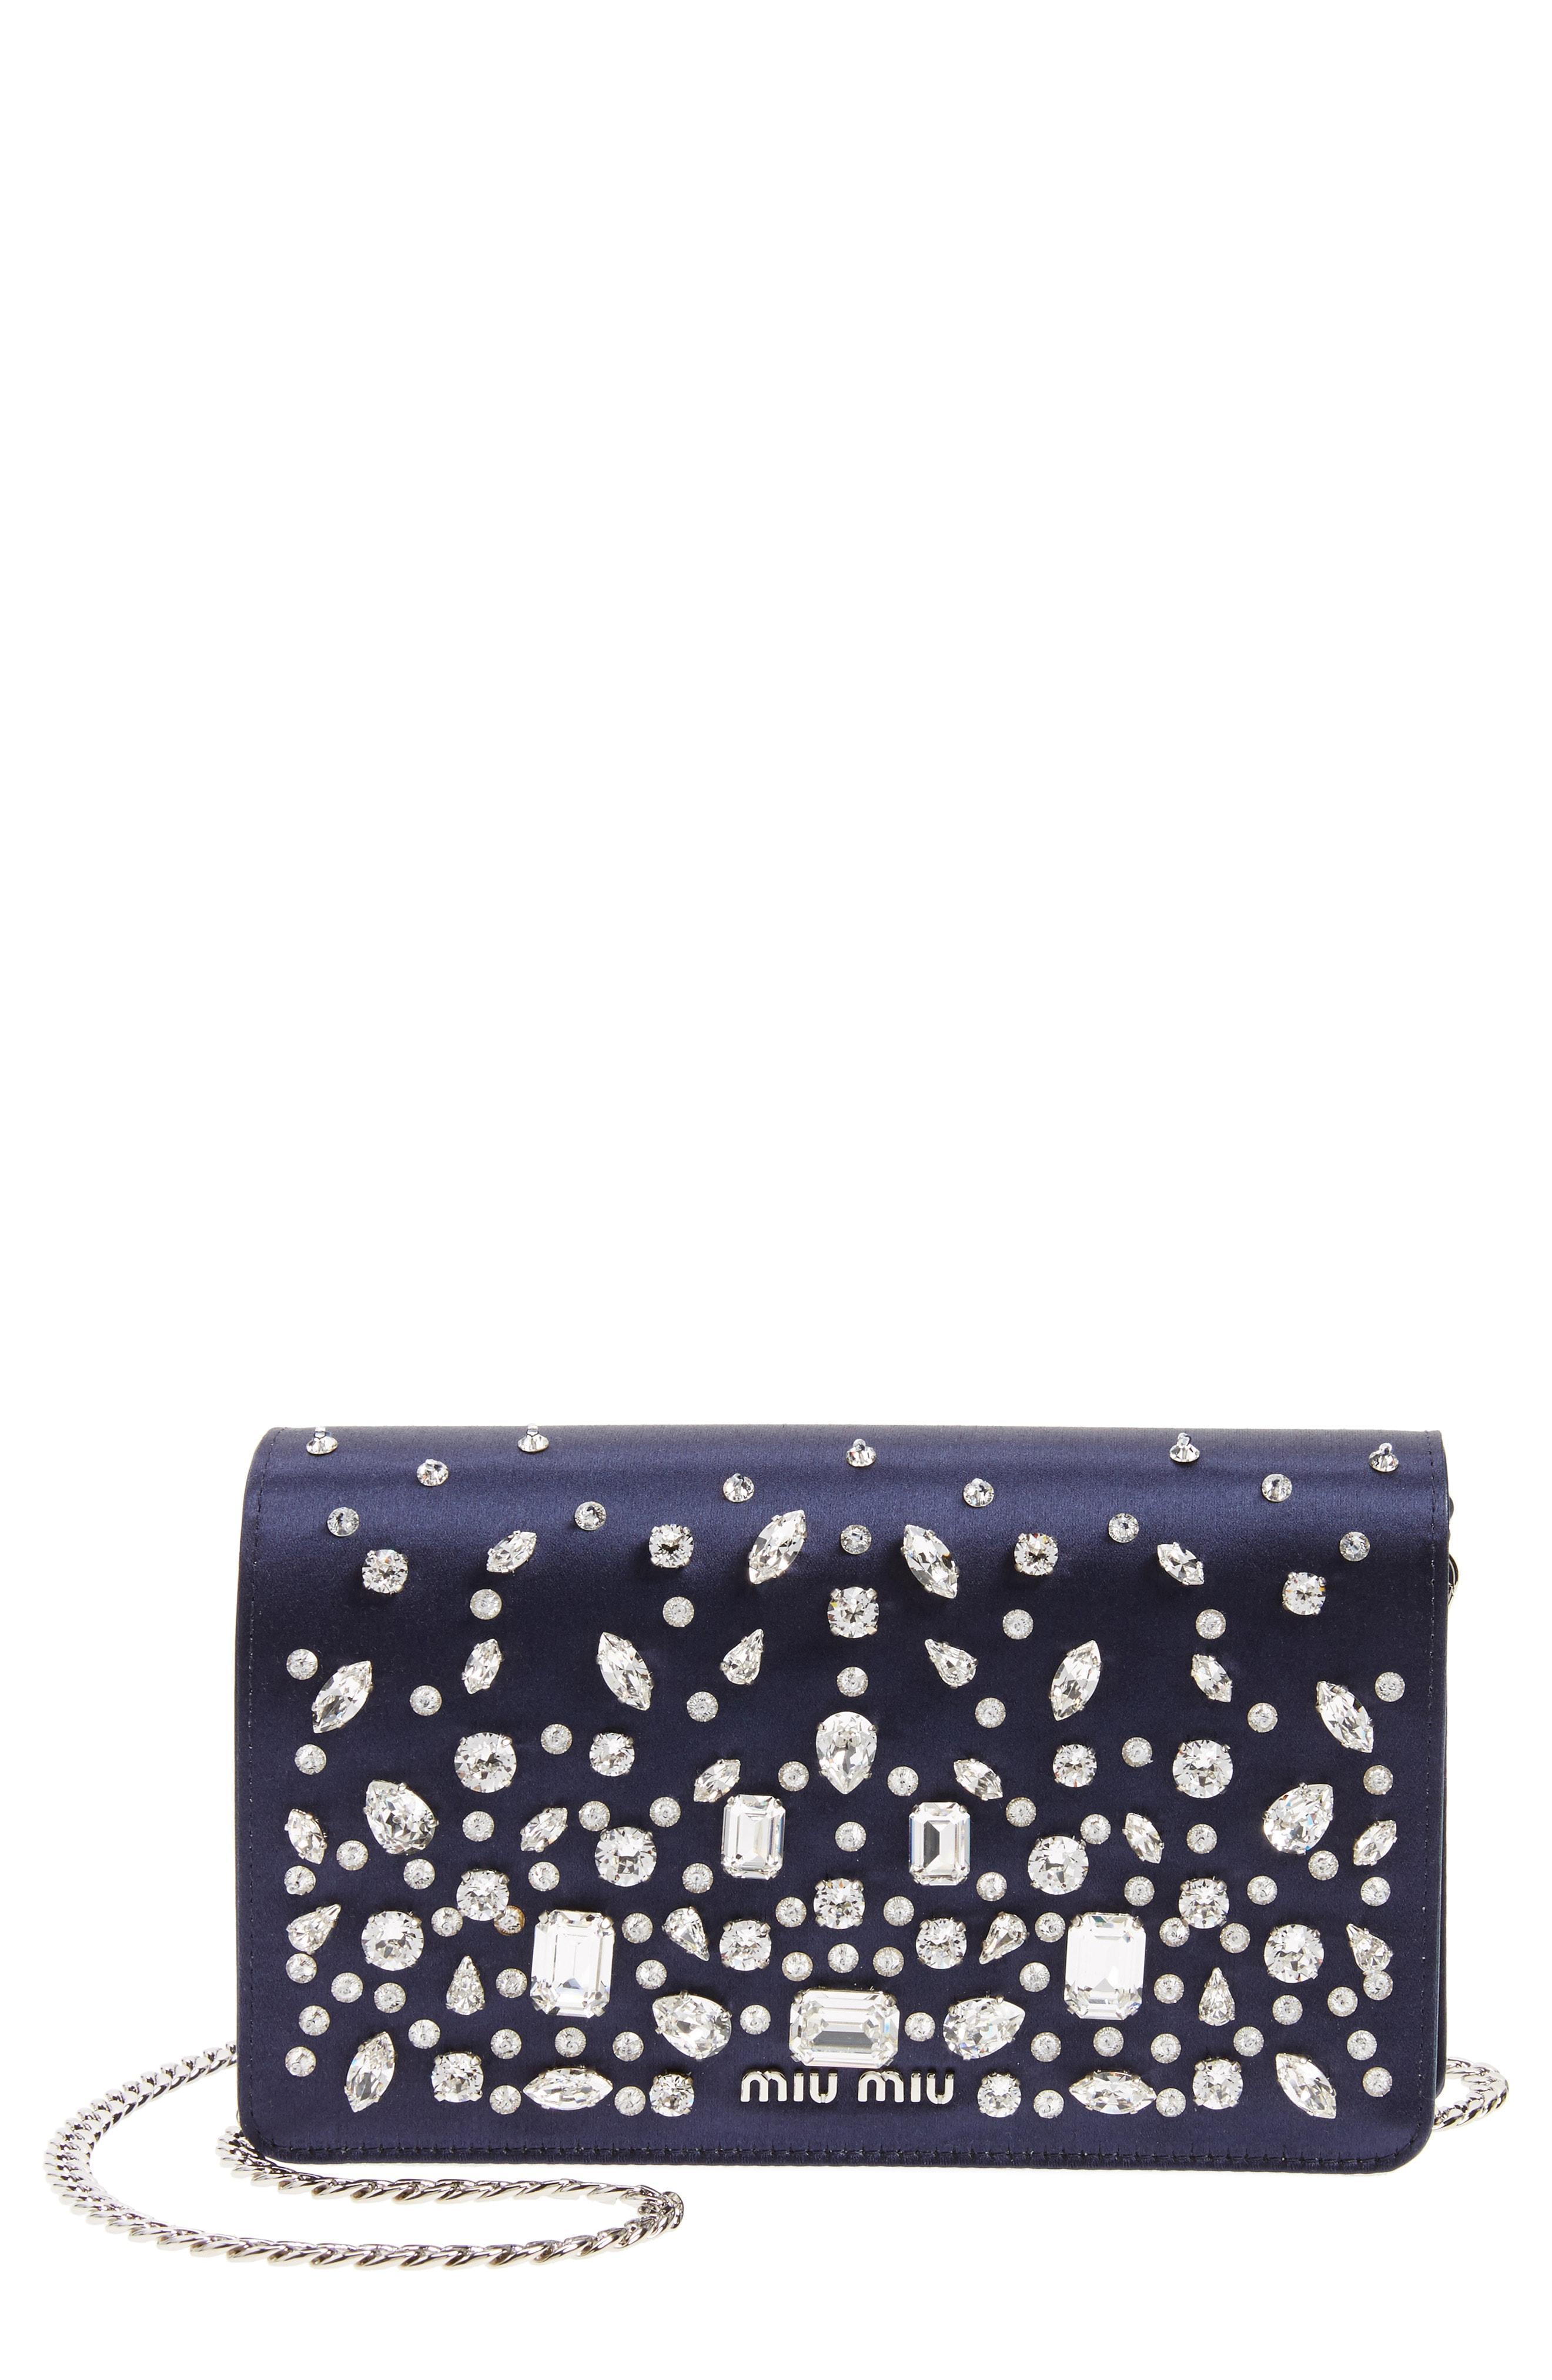 18593435072 Miu Miu Swarovski Crystal Embellished Shoulder Bag - Blue In Baltico ...